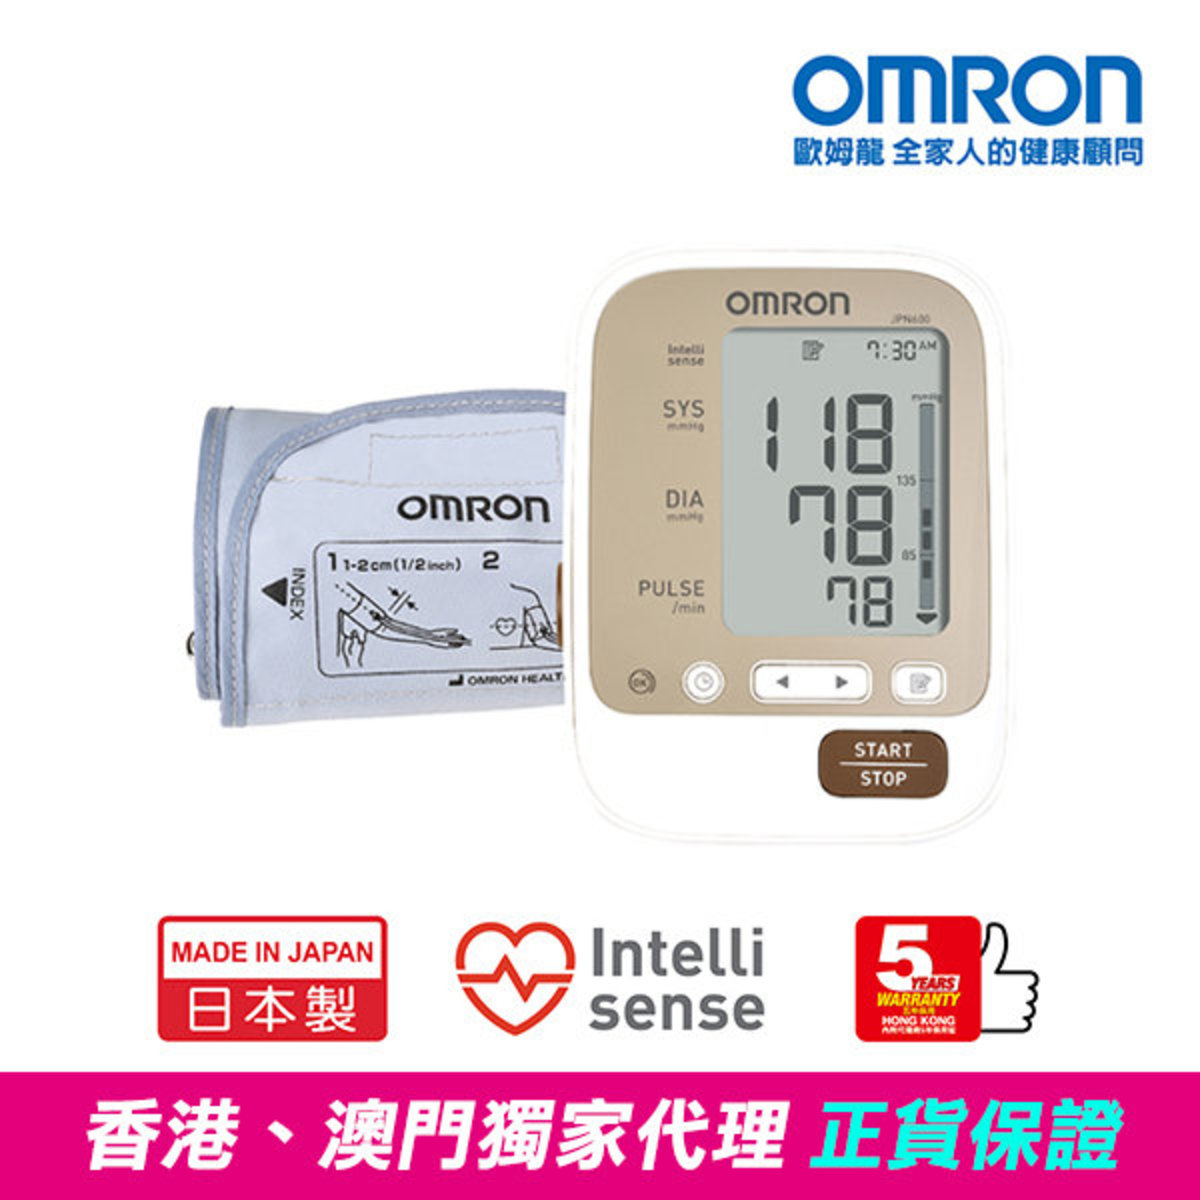 OMRON 歐姆龍 - JPN600 手臂式血壓計